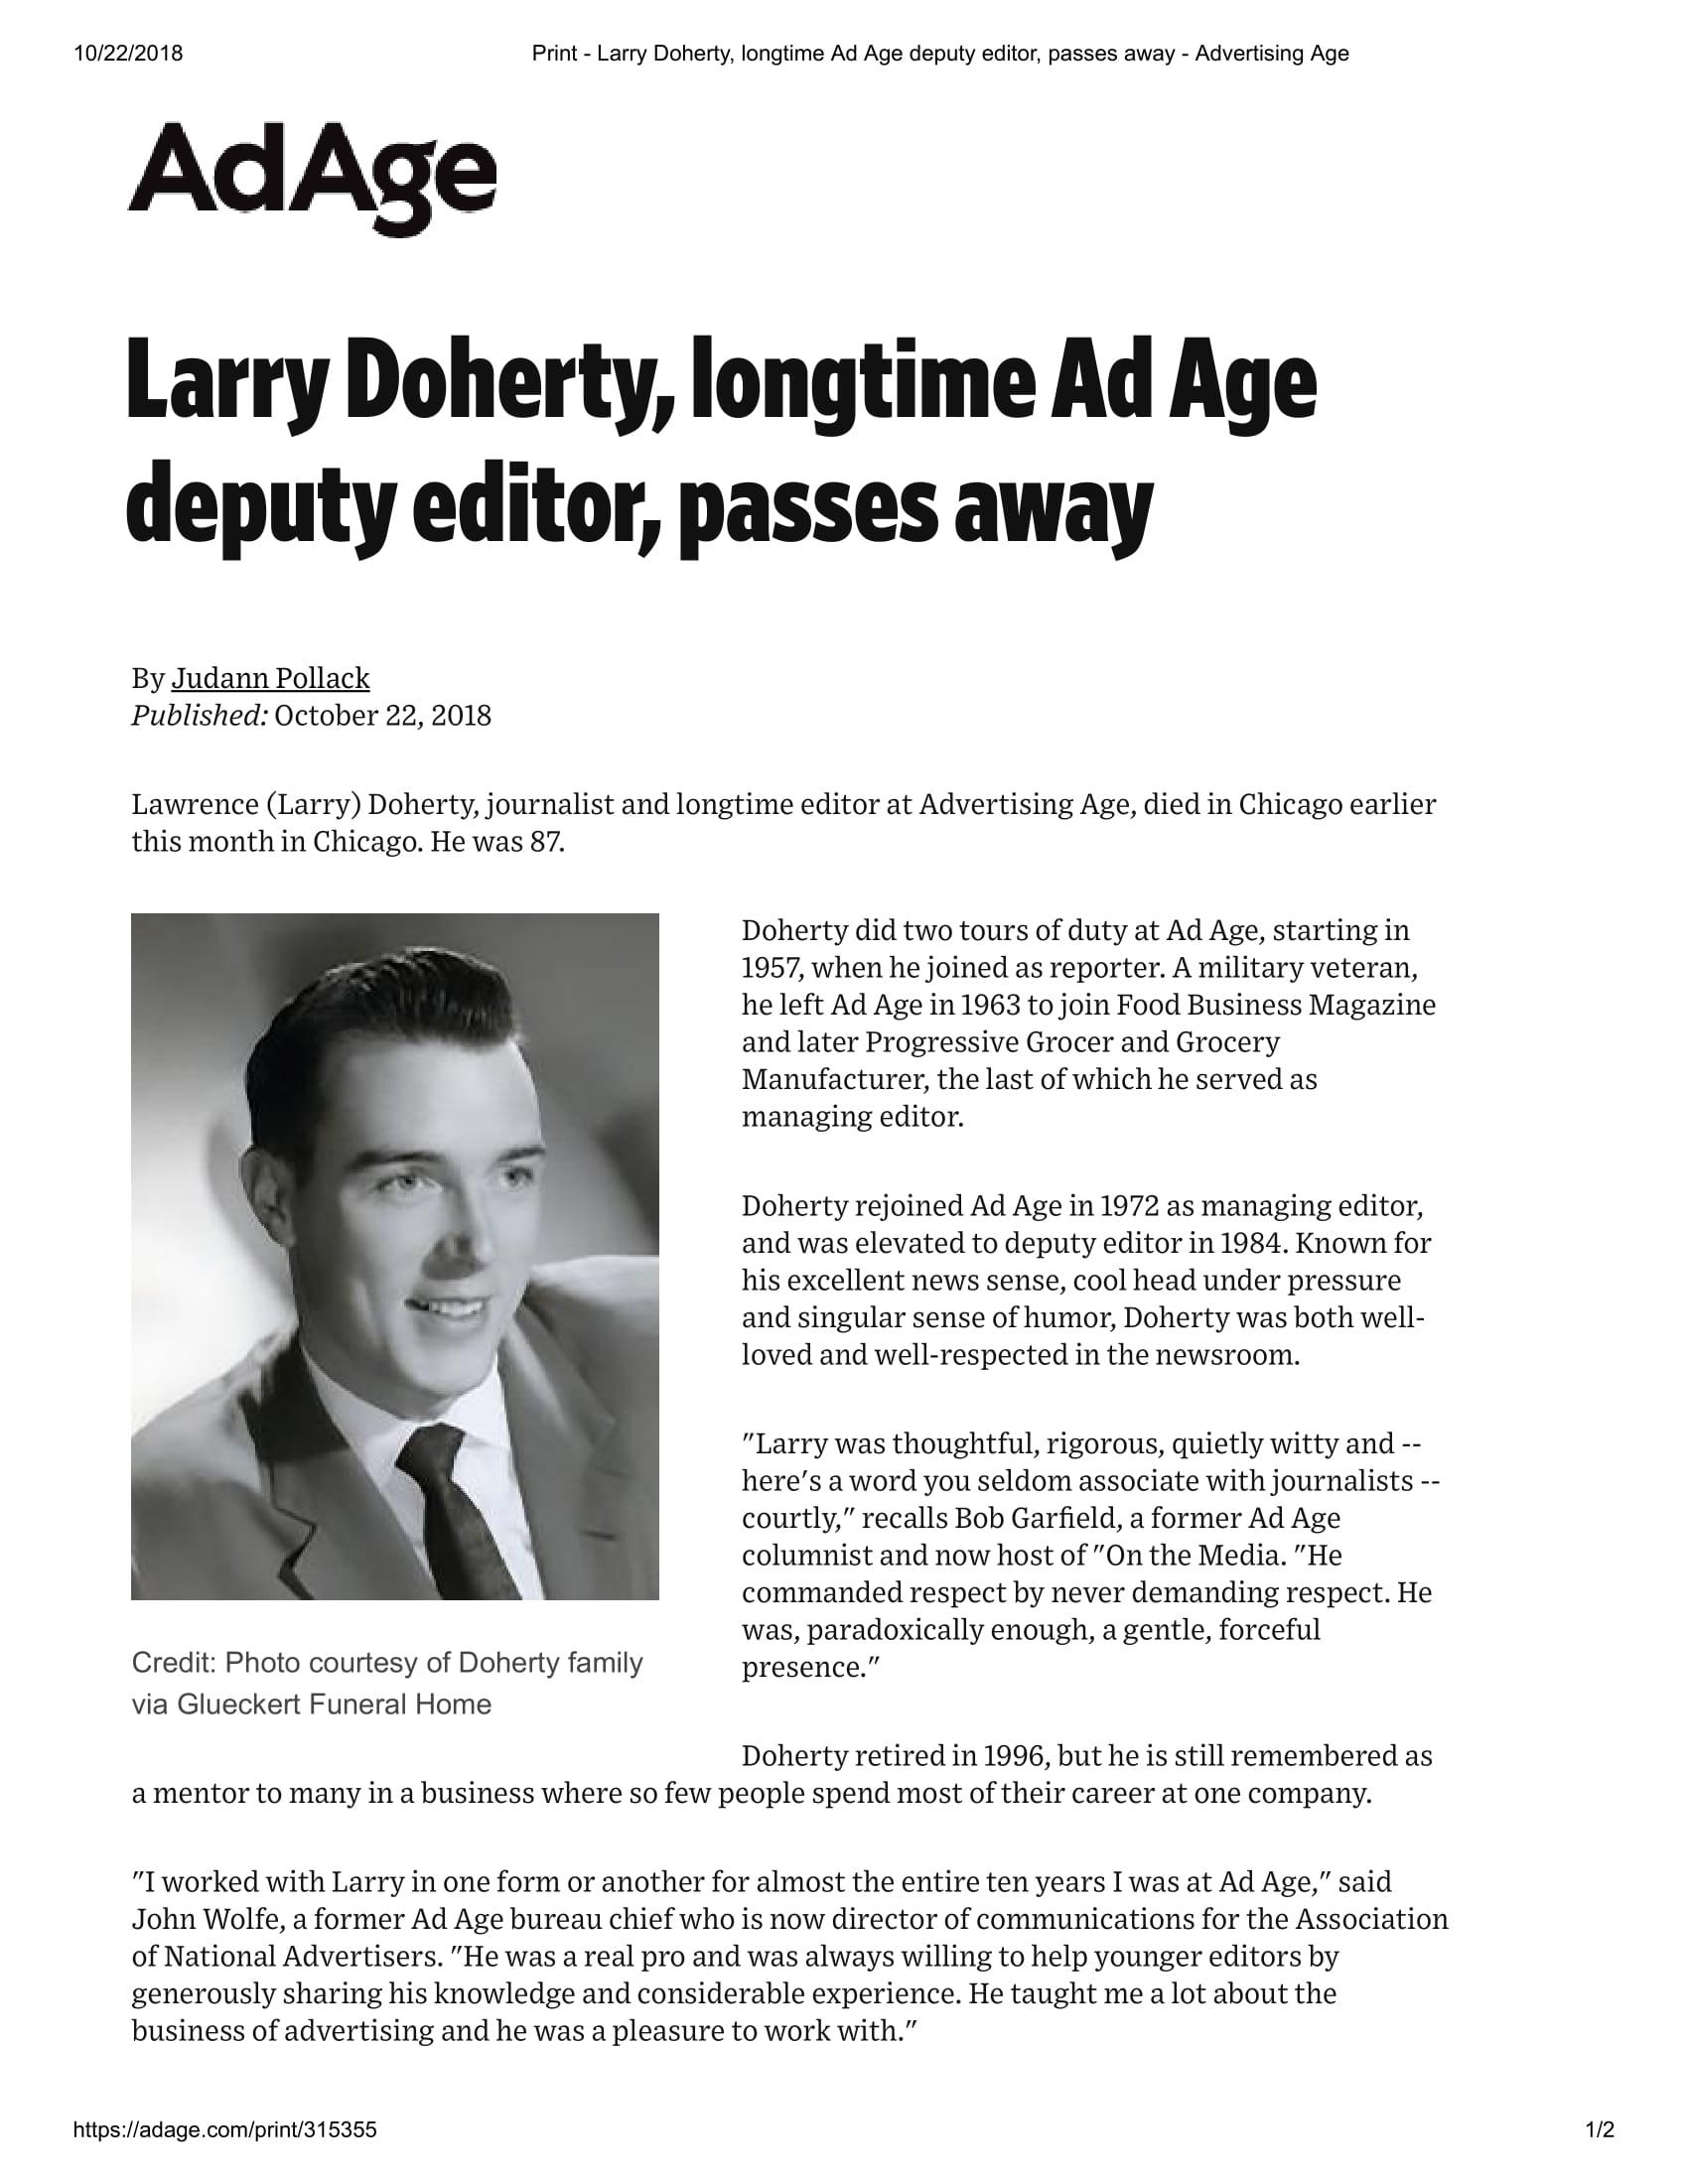 Print - Larry Doherty, longtime Ad Age deputy editor, passes away - Advertising Age-1.jpg